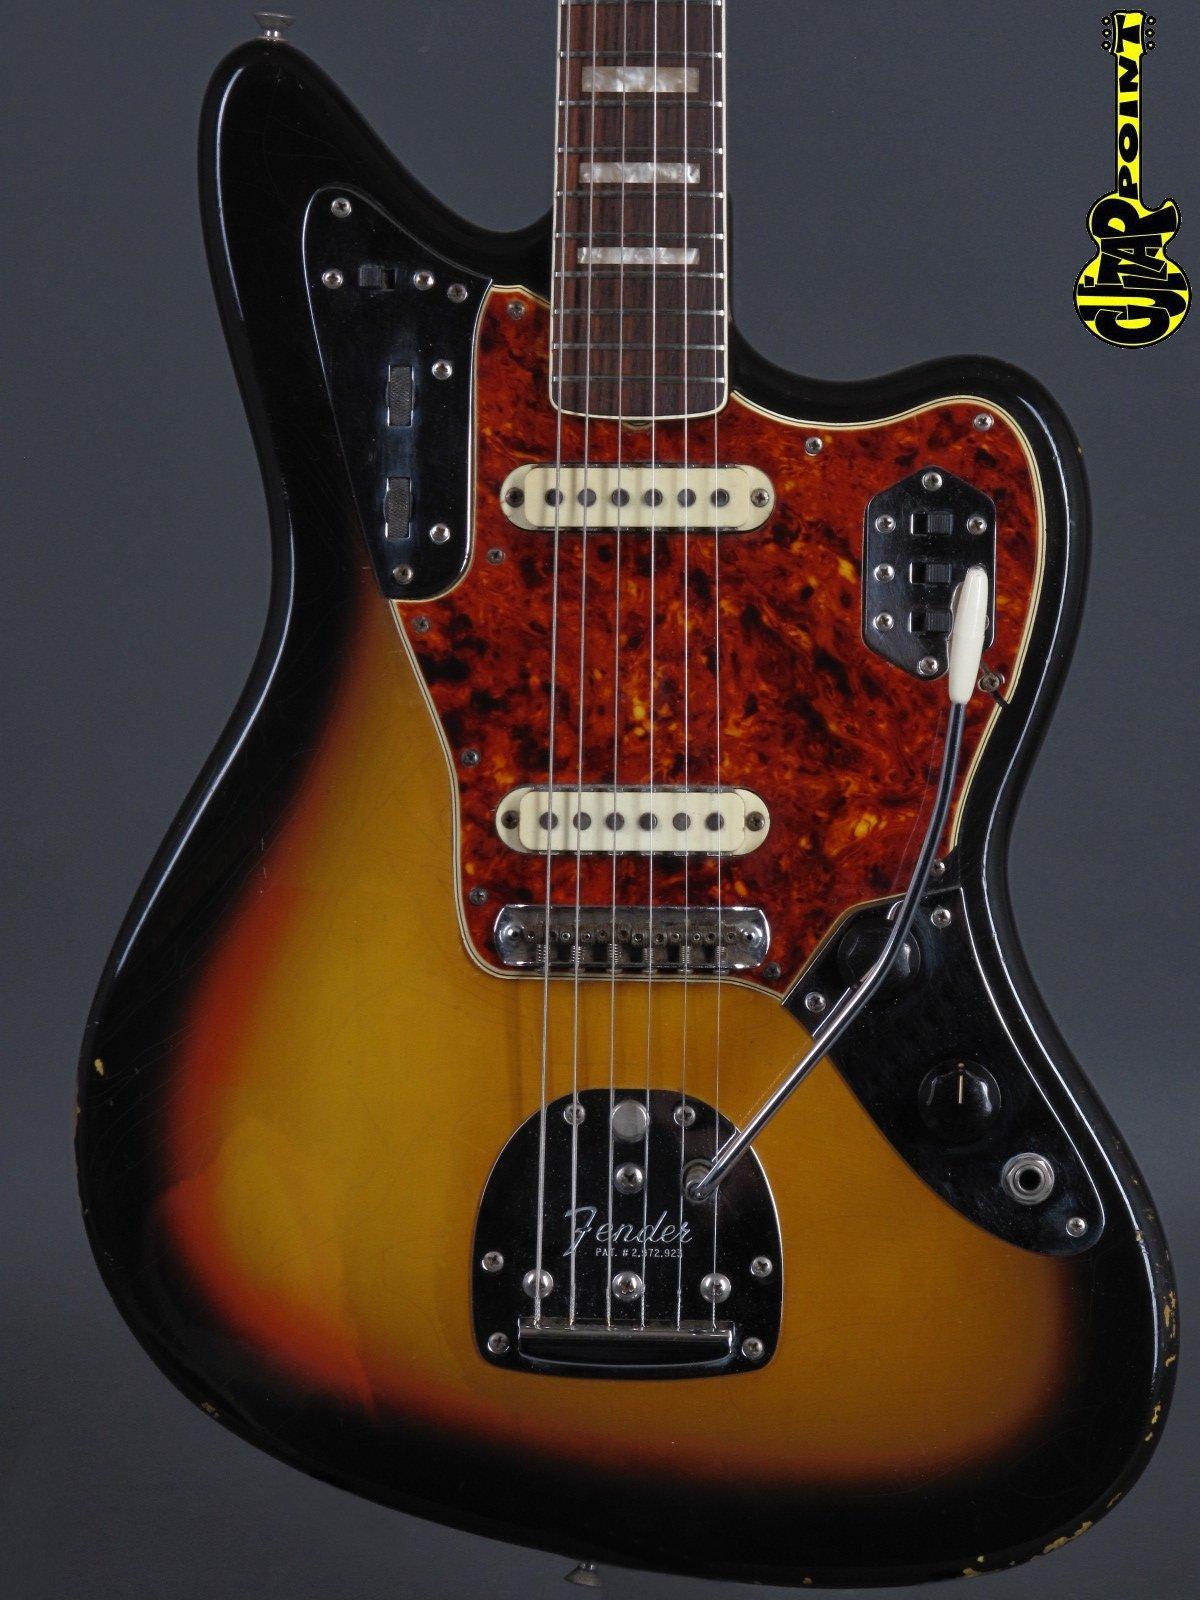 1966 Fender Jaguar – 3-tone Sunburst